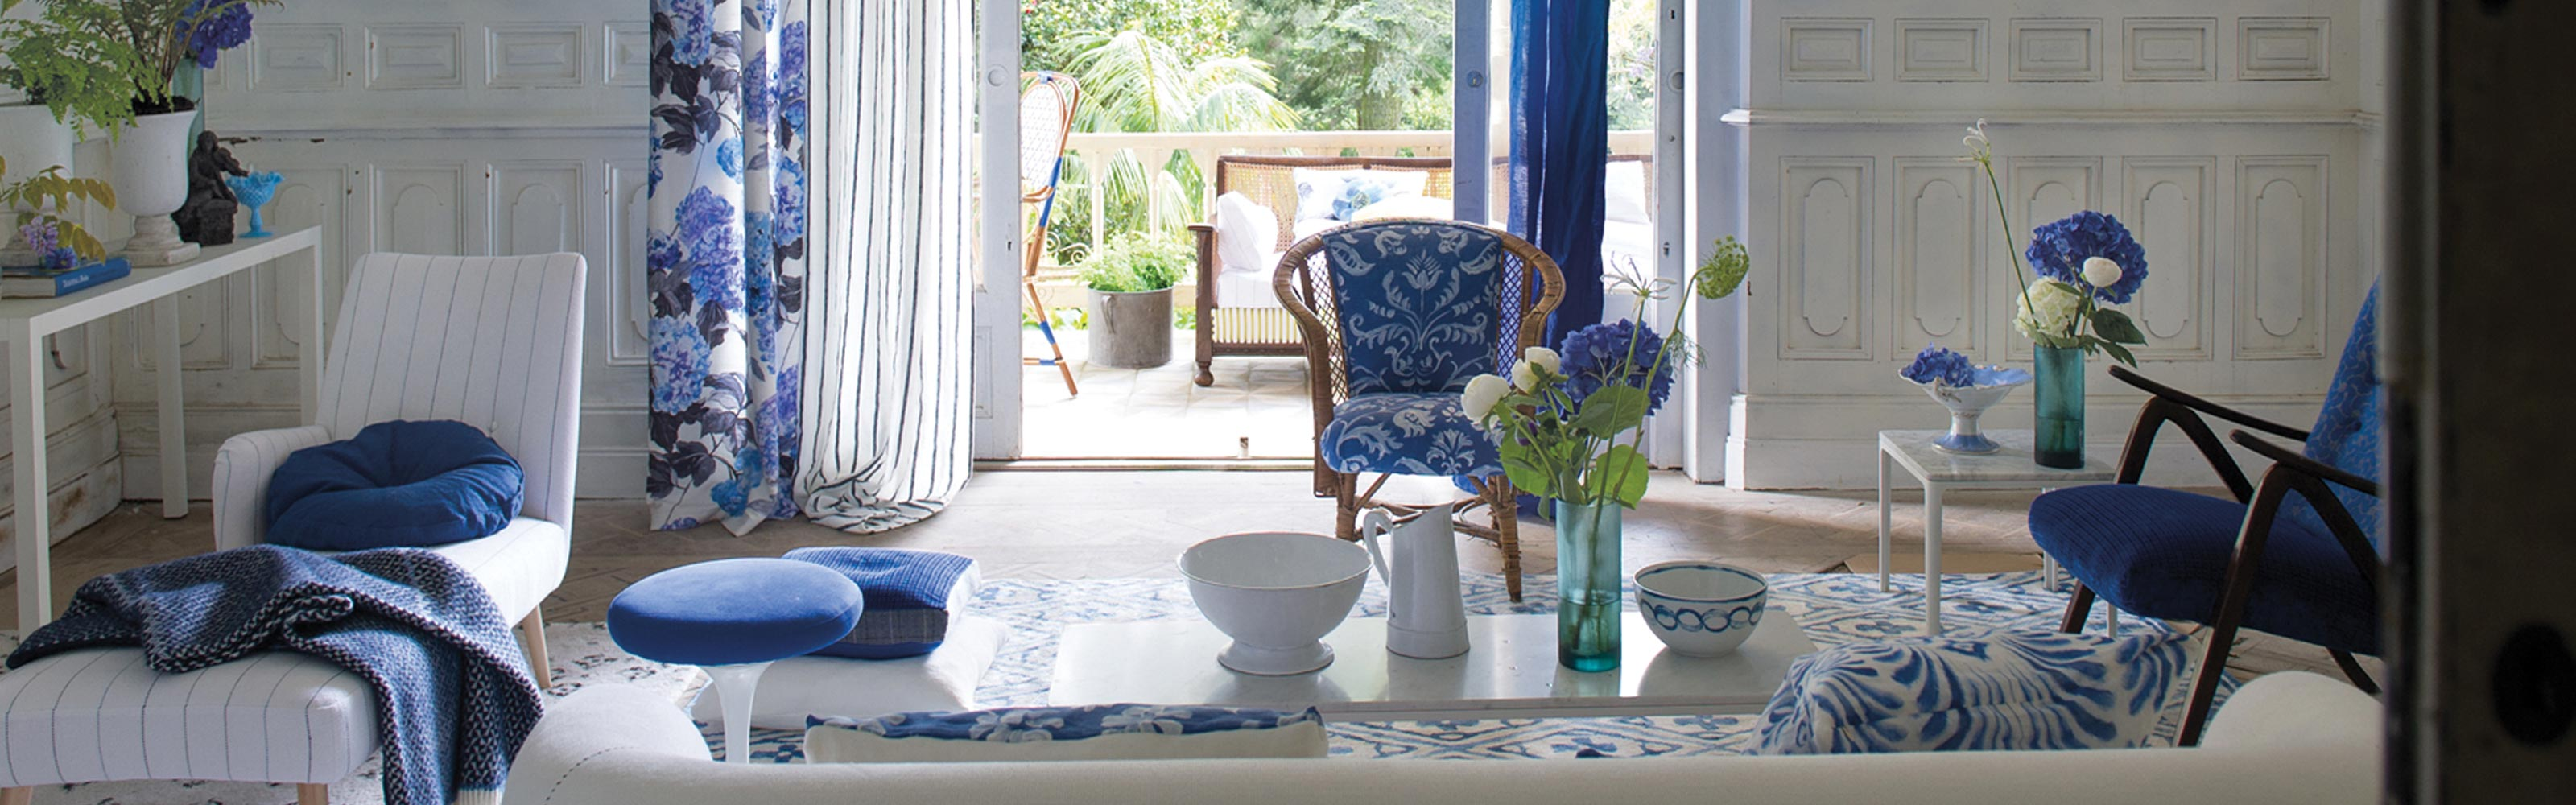 osborne little pacific design center. Black Bedroom Furniture Sets. Home Design Ideas